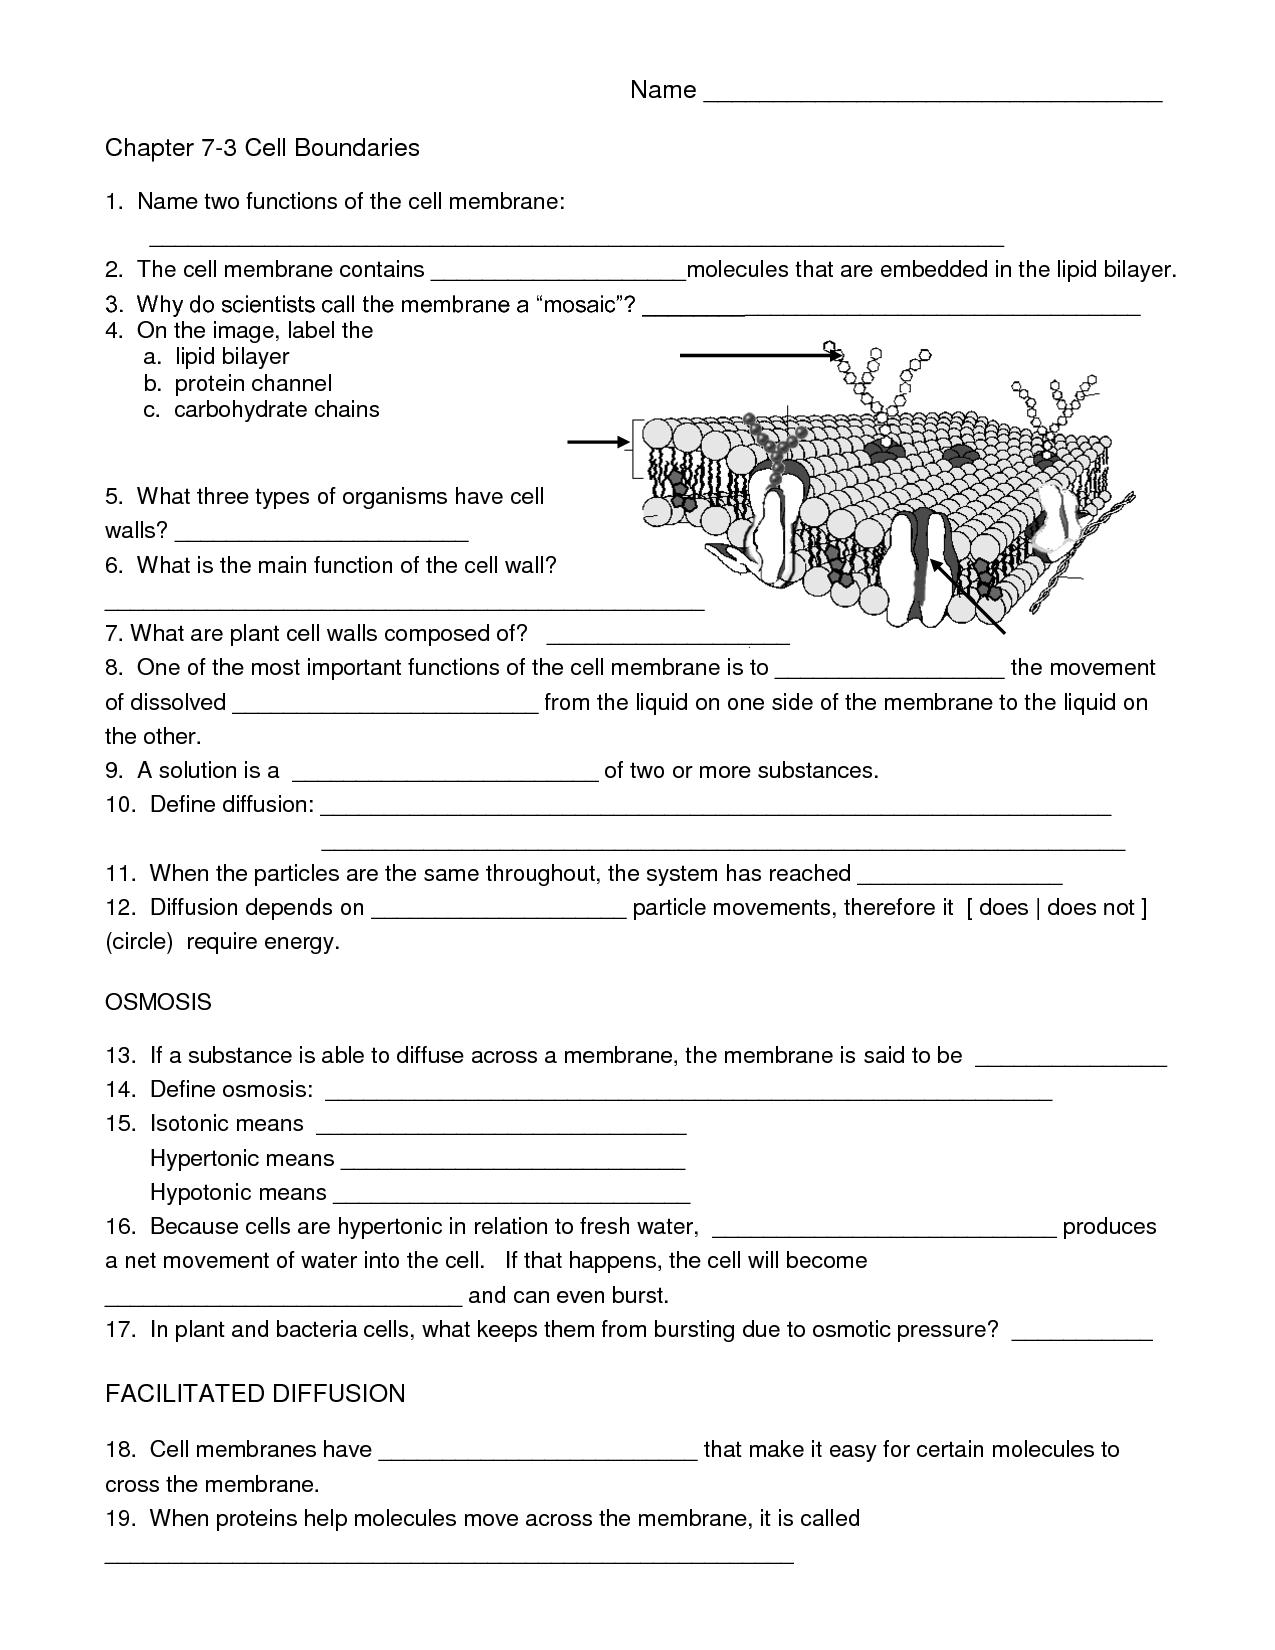 Free Printable Biology Worksheets For High School